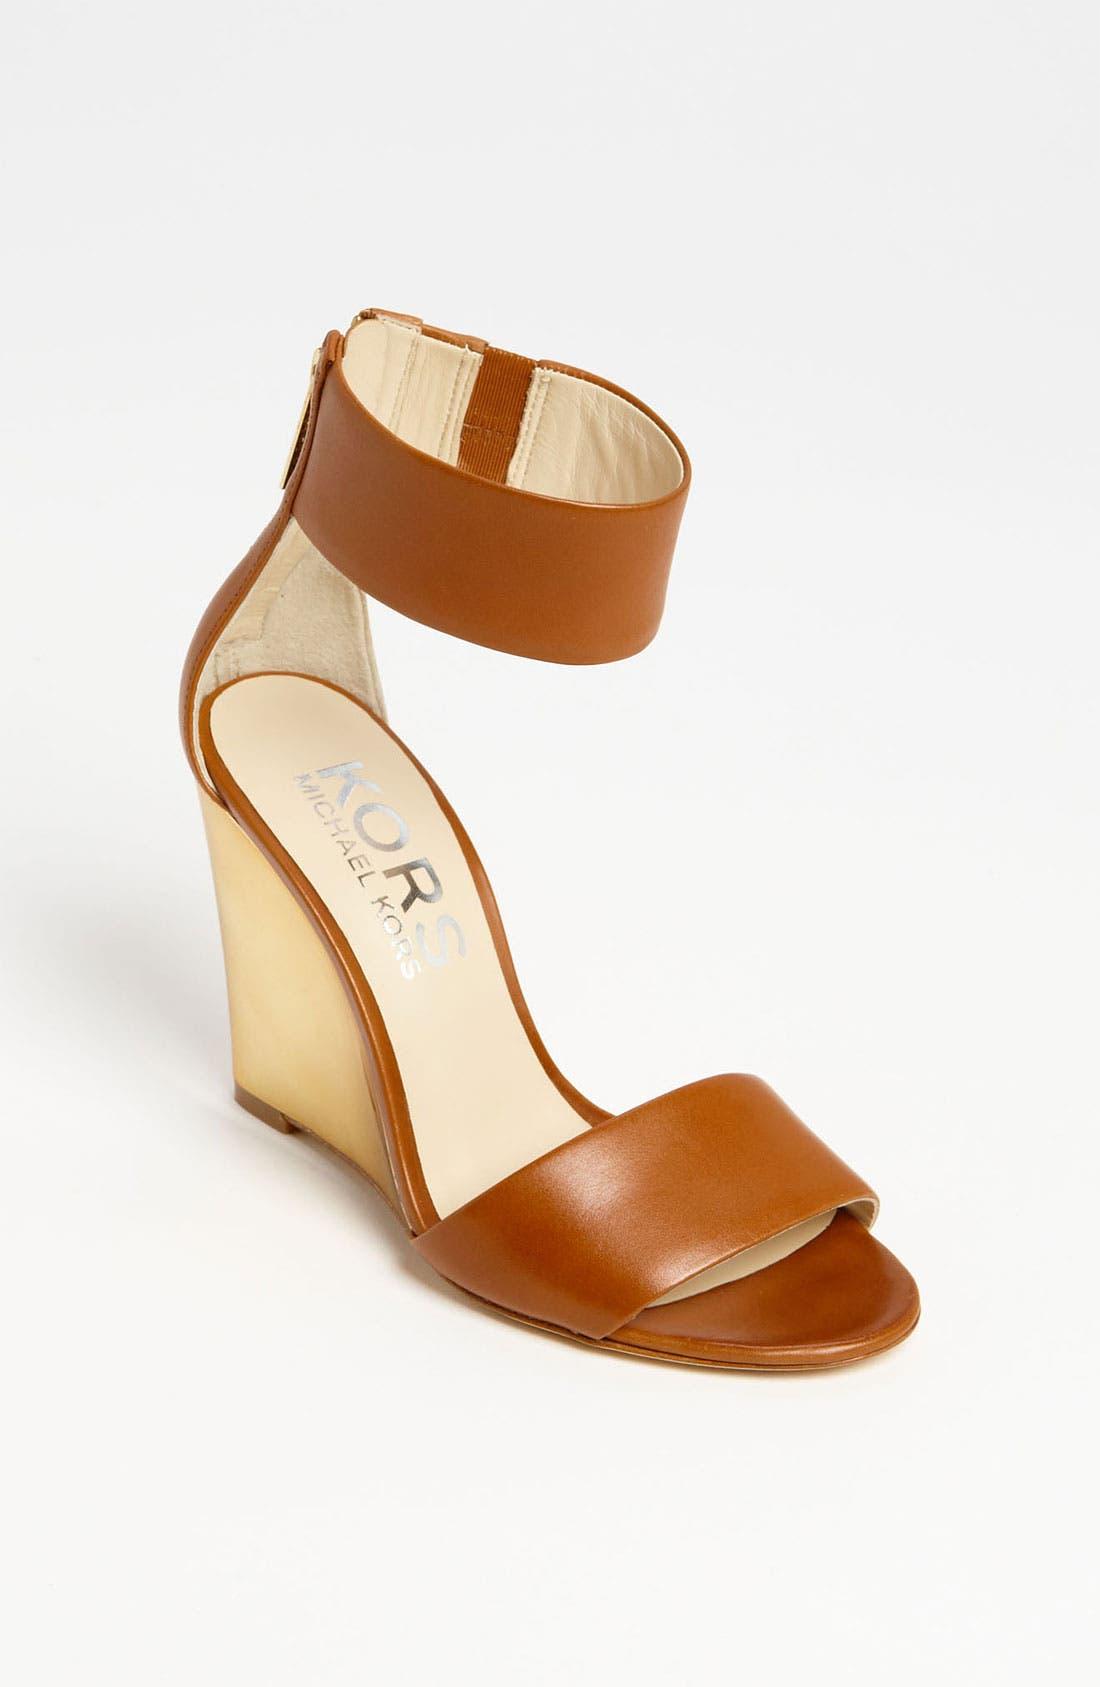 Main Image - KORS Michael Kors 'Rosalie' Sandal